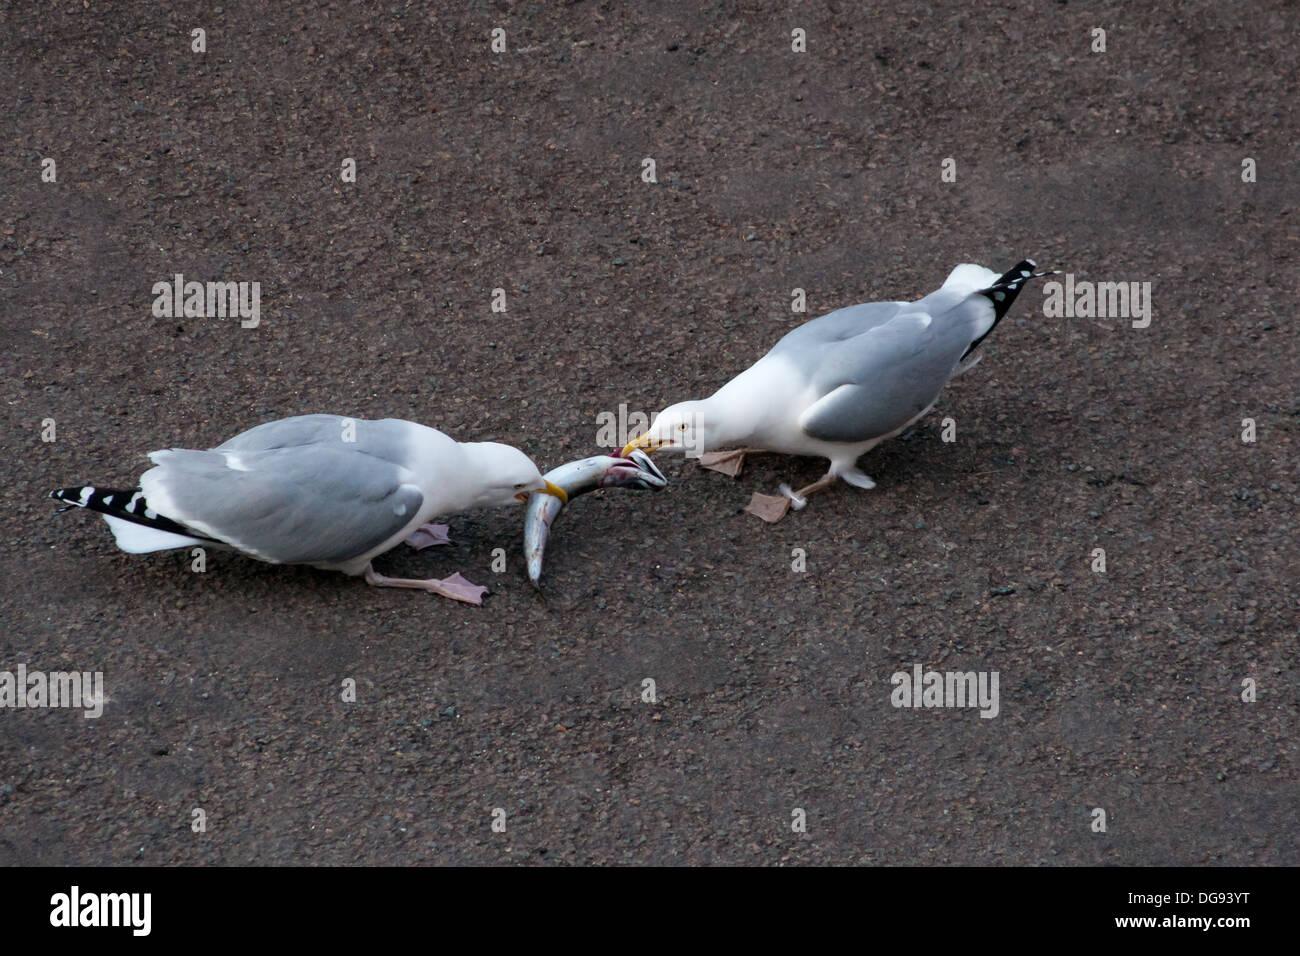 Seagulls fighting over a fish Mackrell Herring gulls fighting - Stock Image